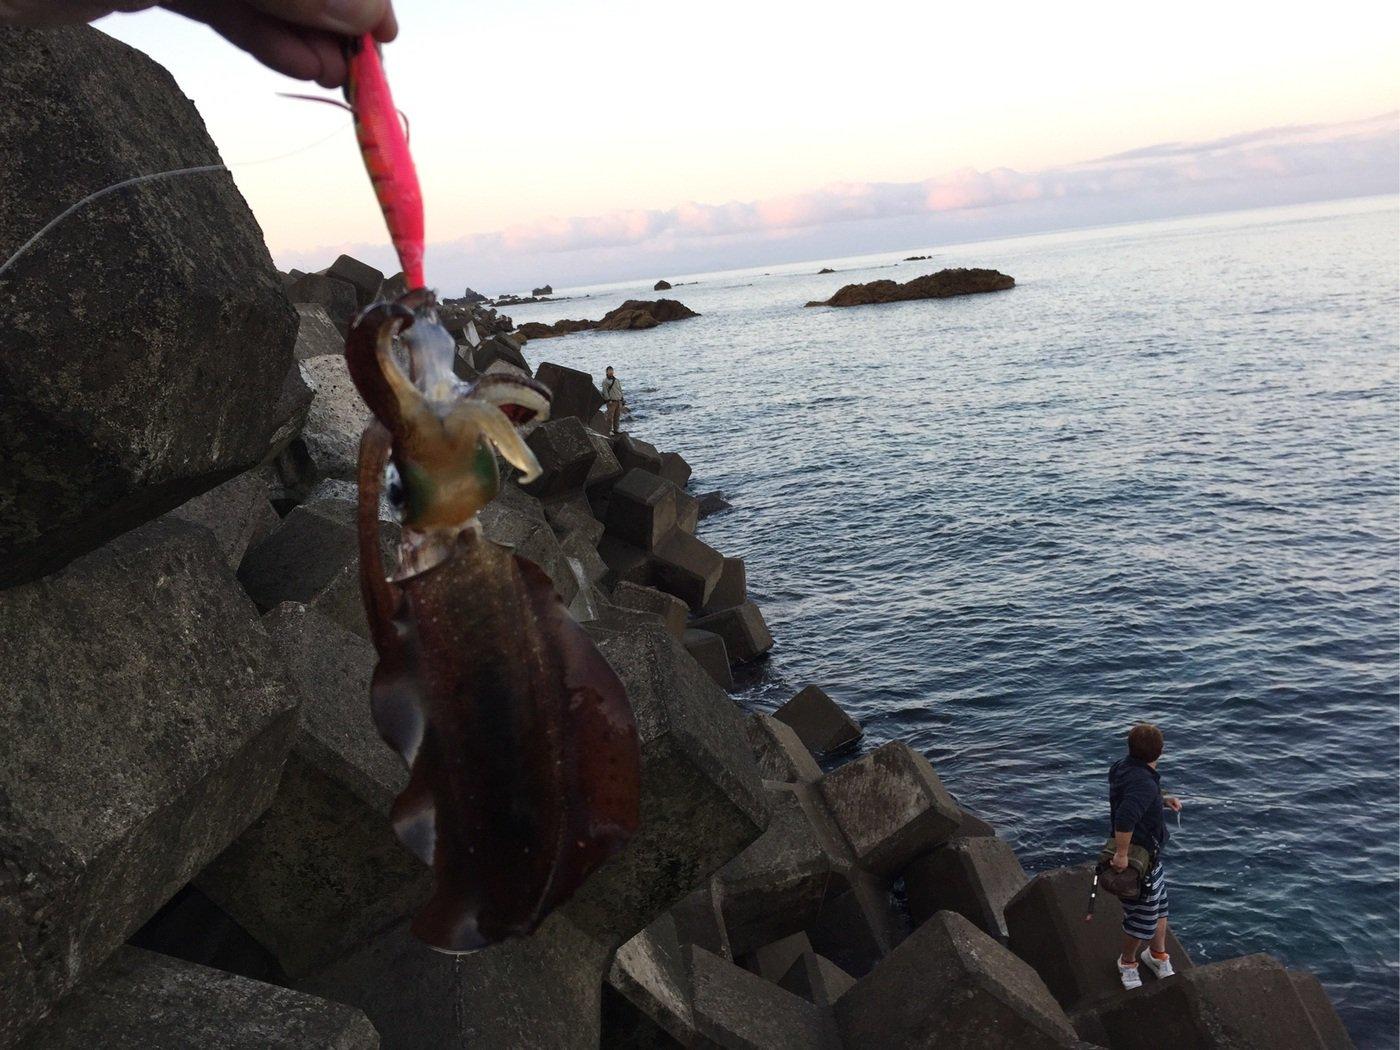 cpcnv100さんの投稿画像,写っている魚はアオリイカ